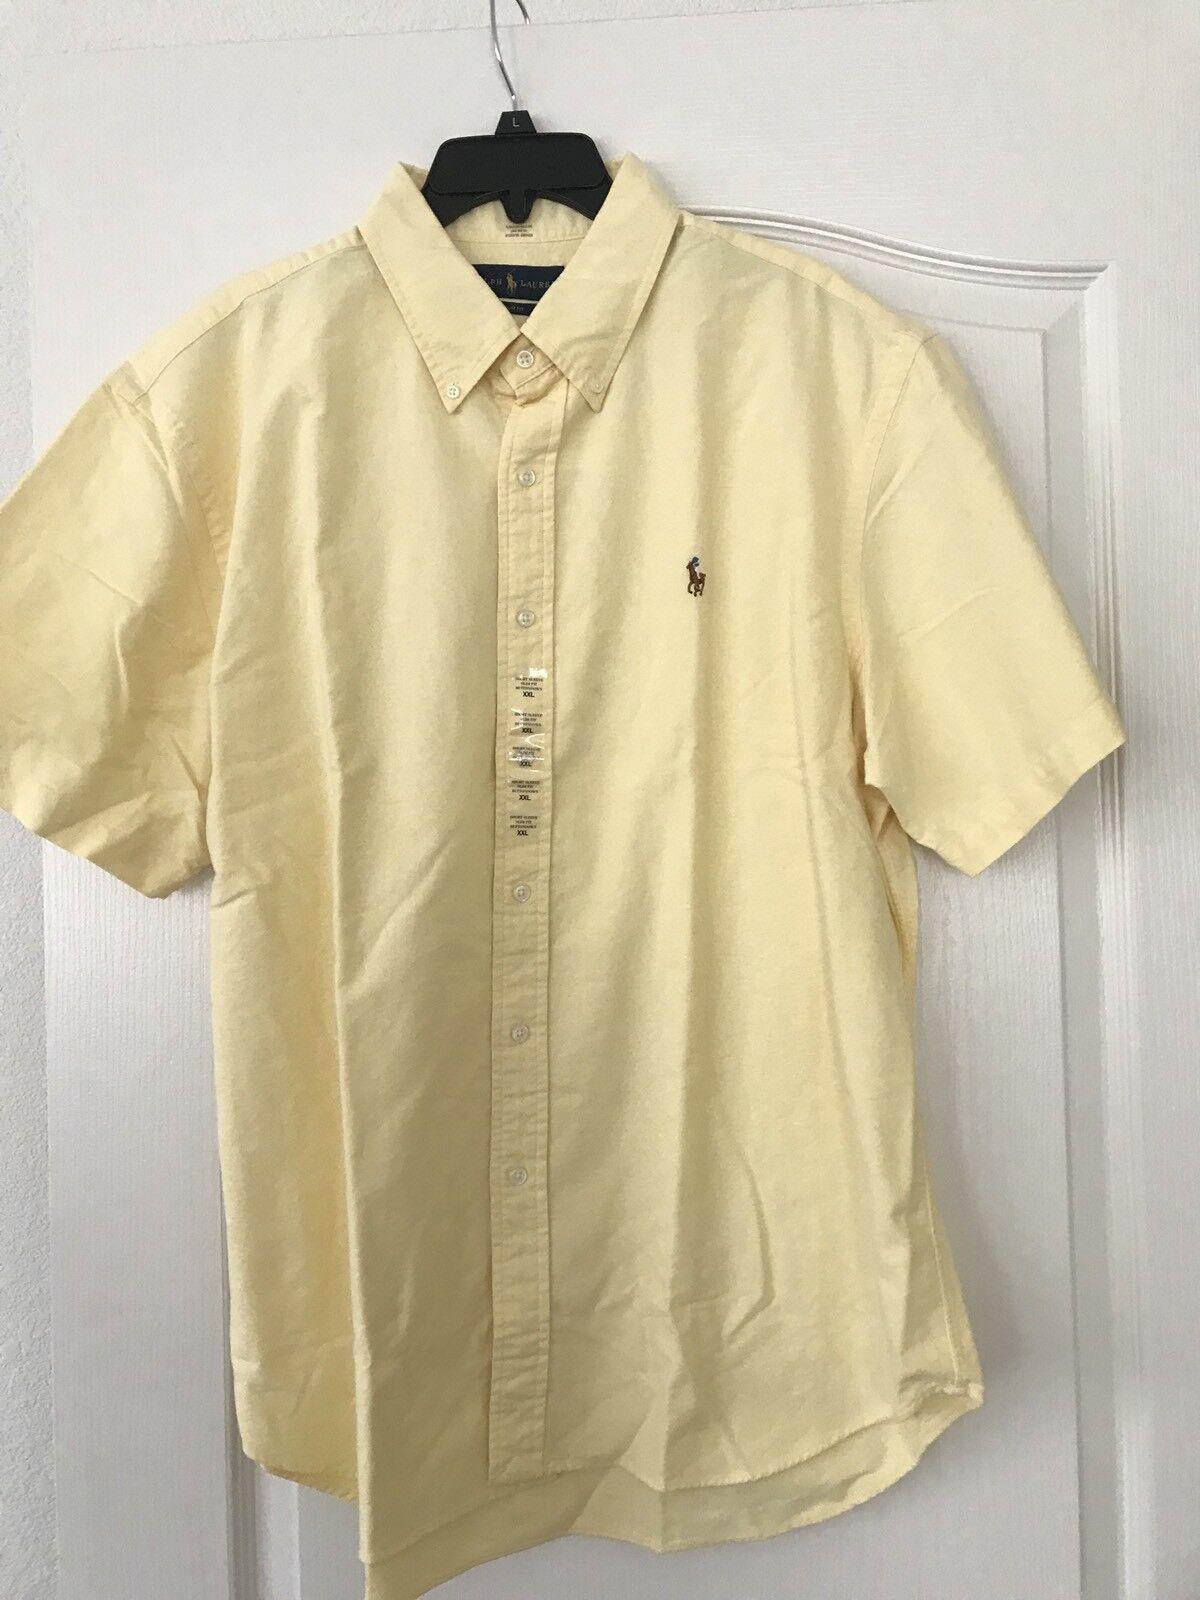 Polo Ralph Lauren Small  Pony  Gelb  Oxford   Shirt XXLarge  XXL Slim Fit